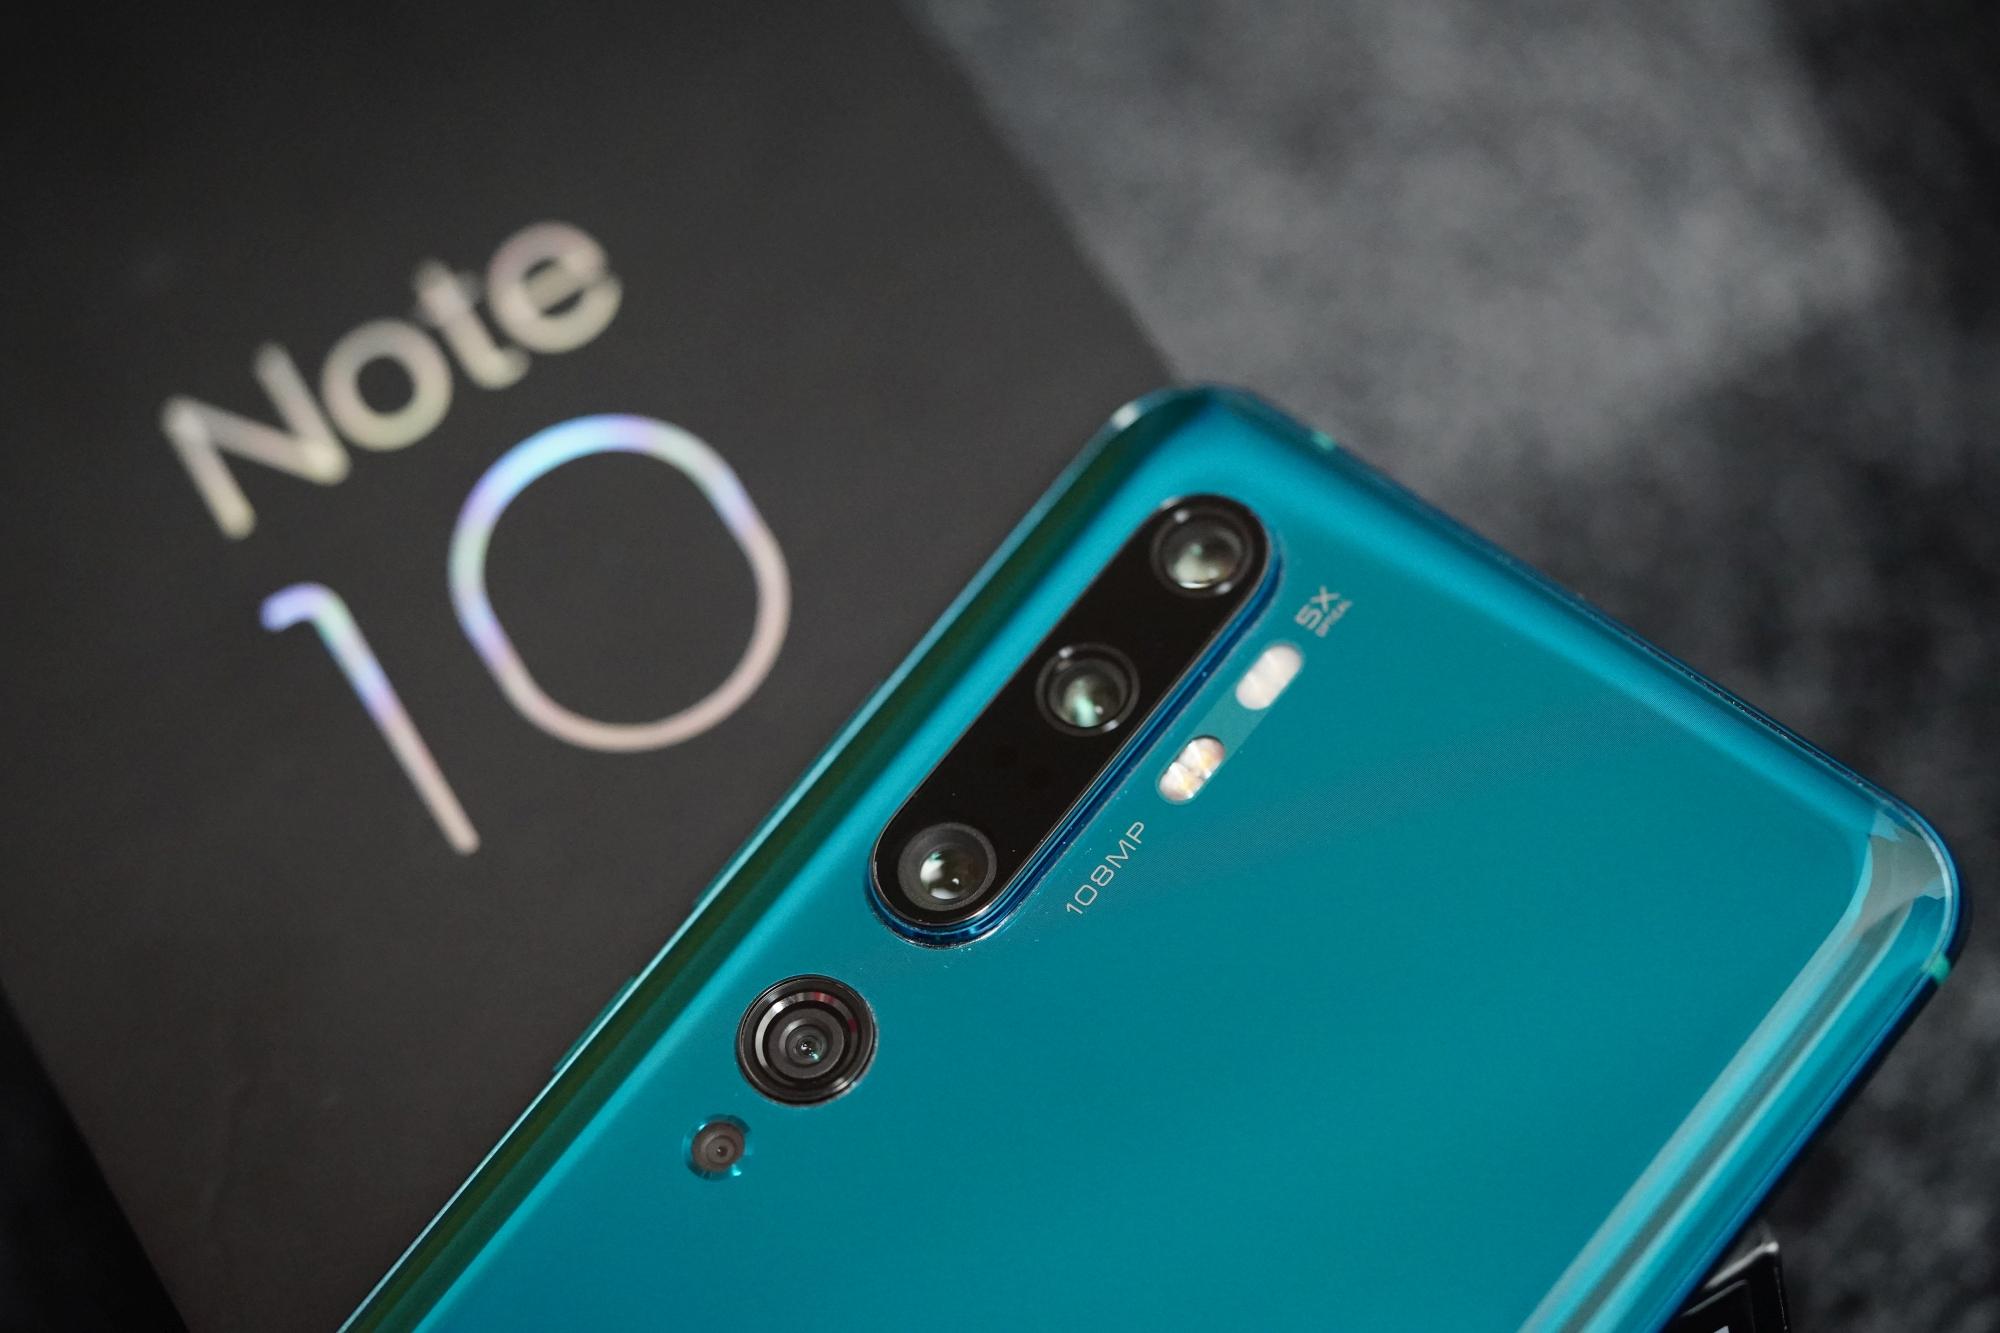 smartfon Xiaomi Mi Note 10 smartphone fot. Tabletowo.pl